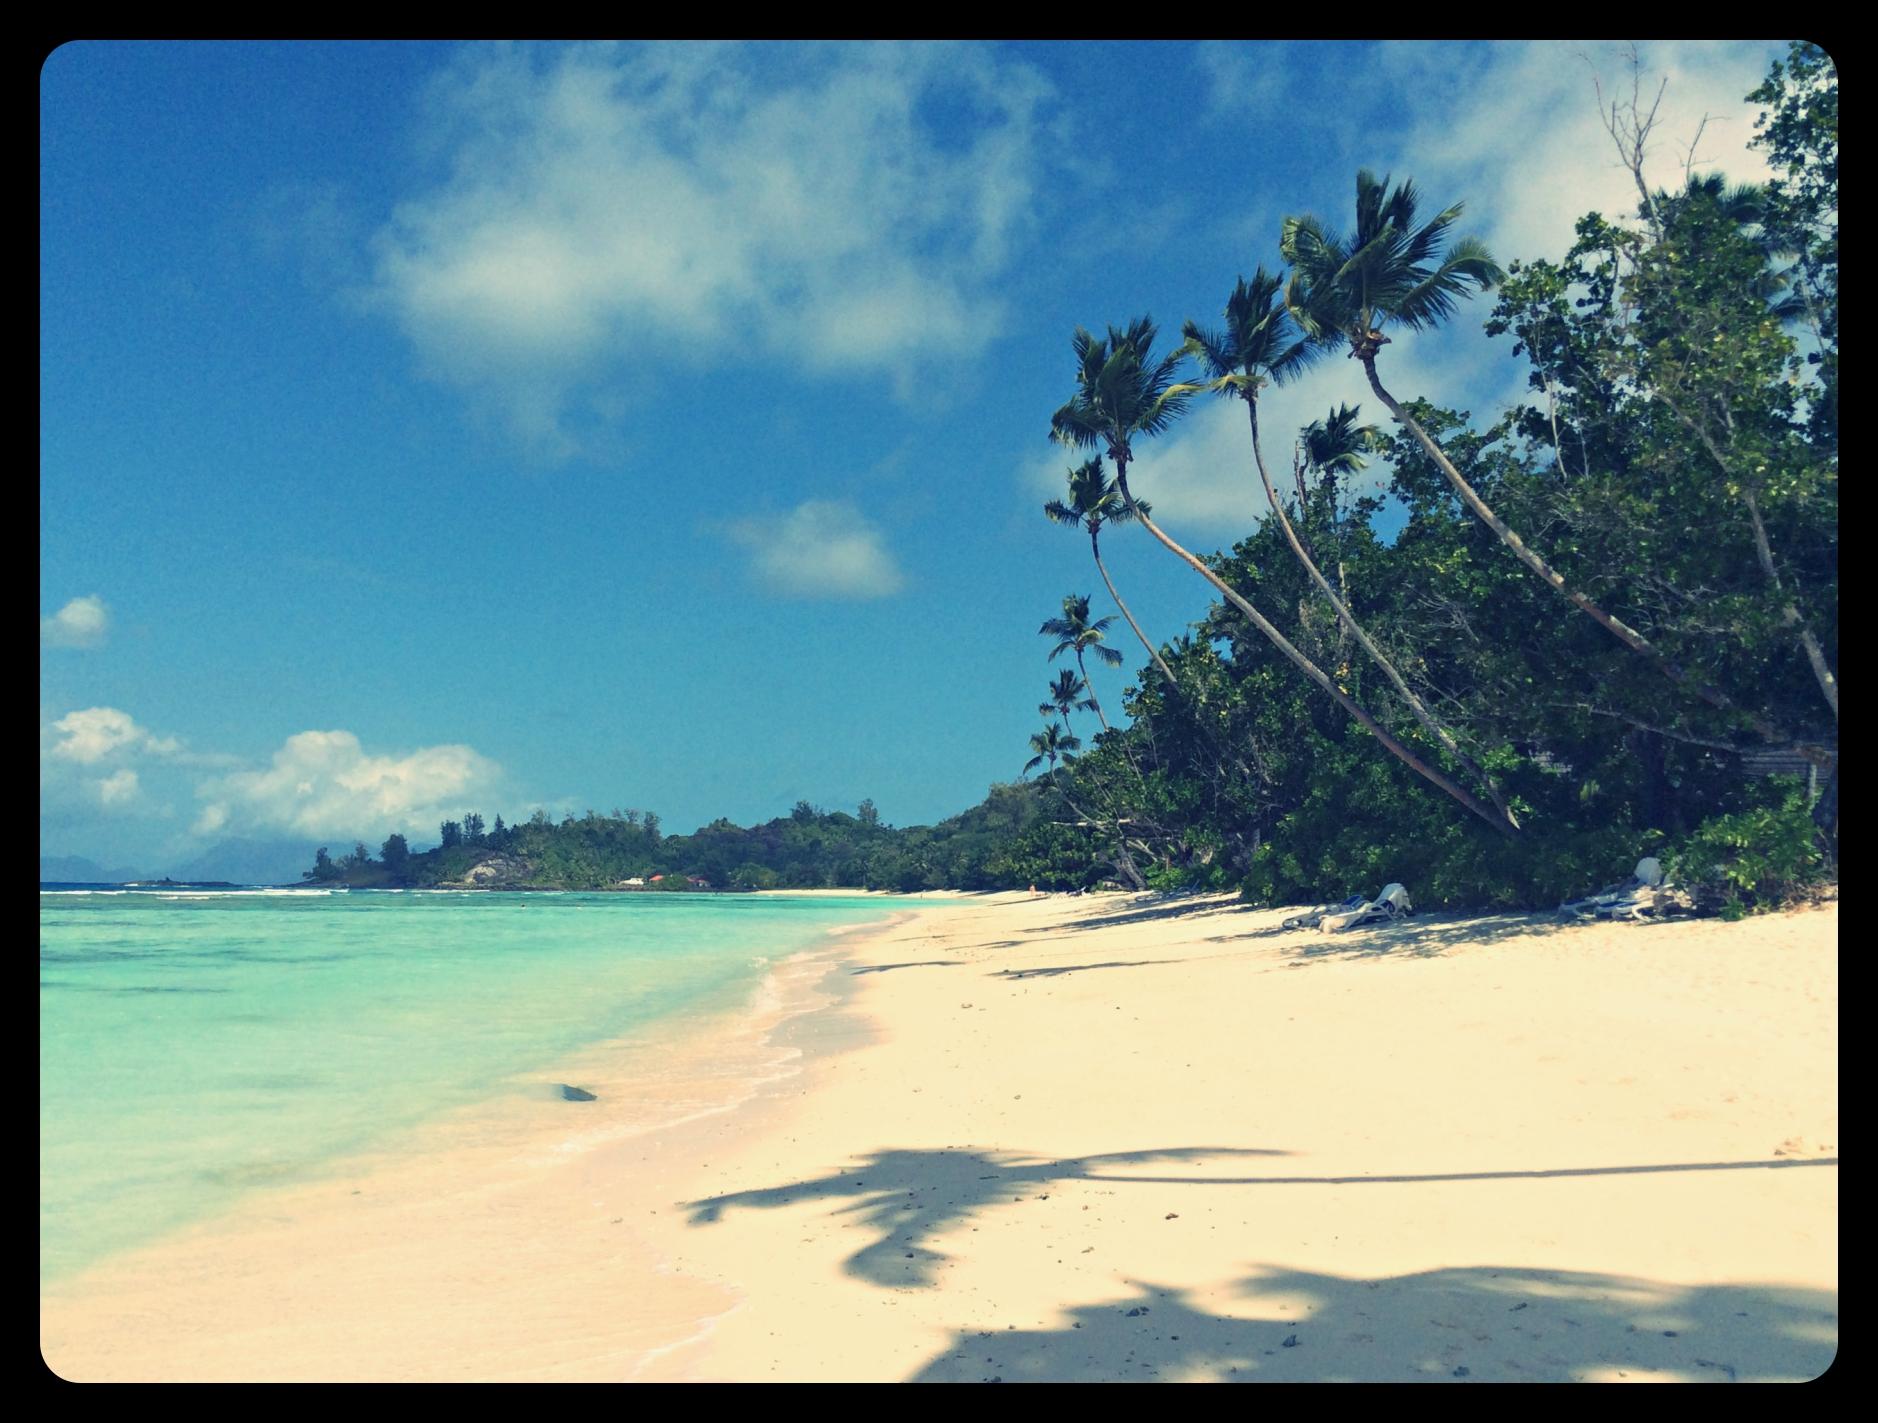 beach_hilton_altertonative.JPG